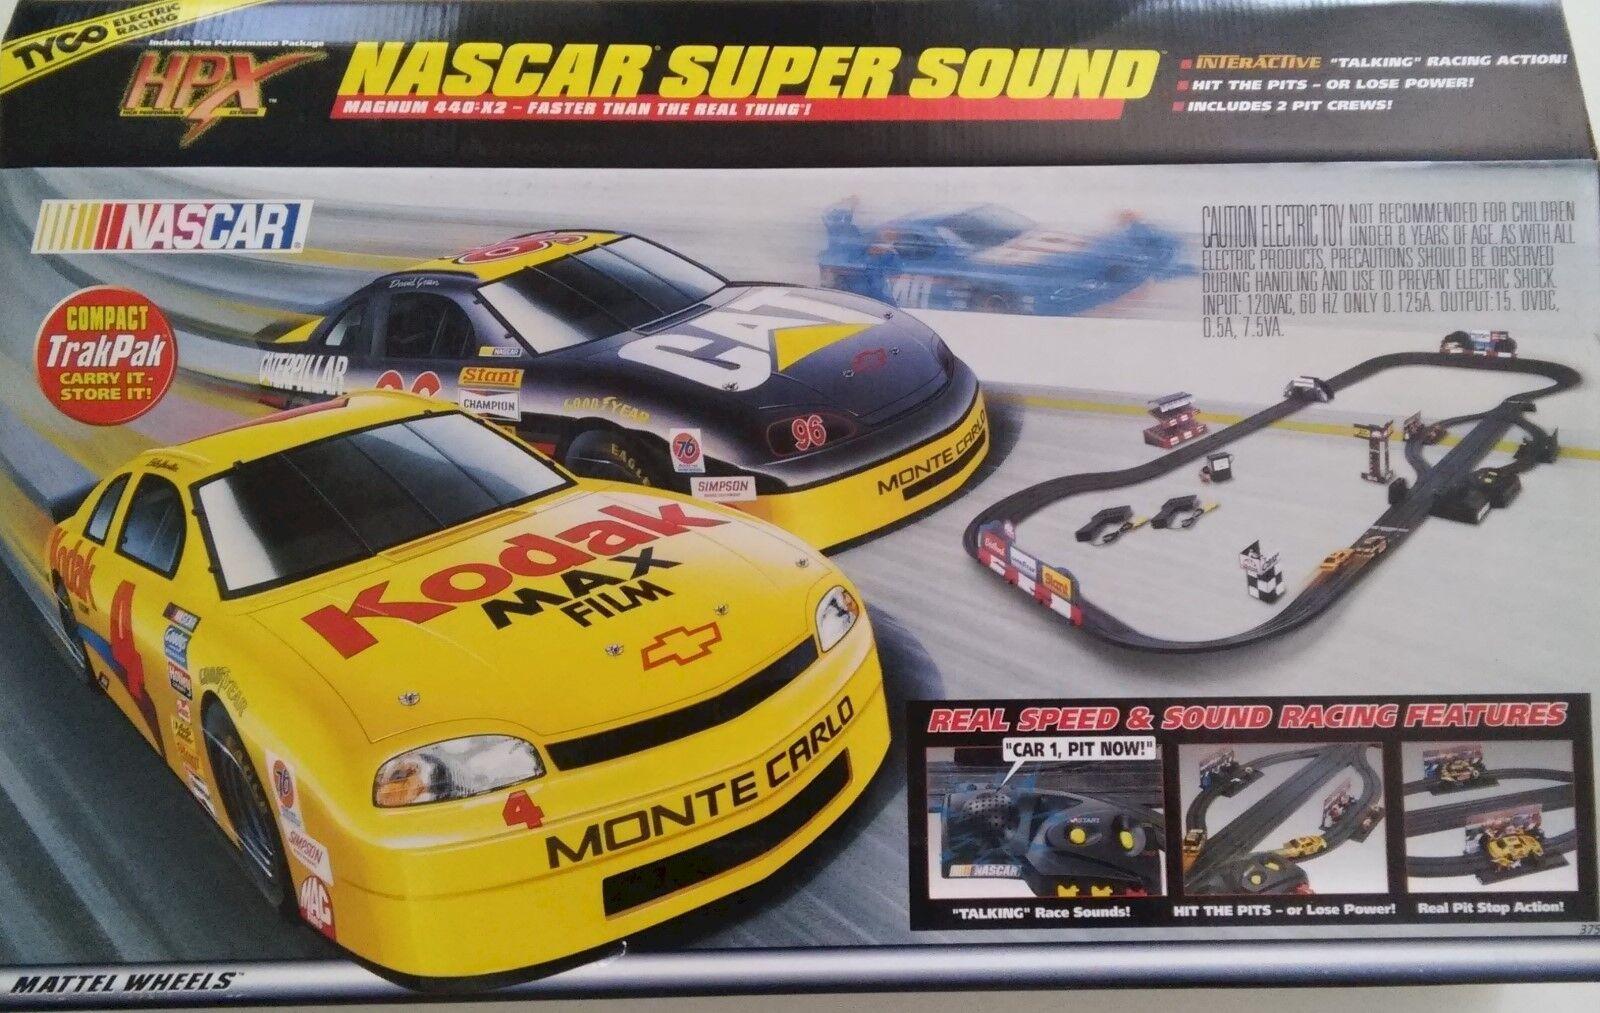 1998 TYCO NASCAR Super Sound -magnum Slot Car 440x2 #37574 | eBay